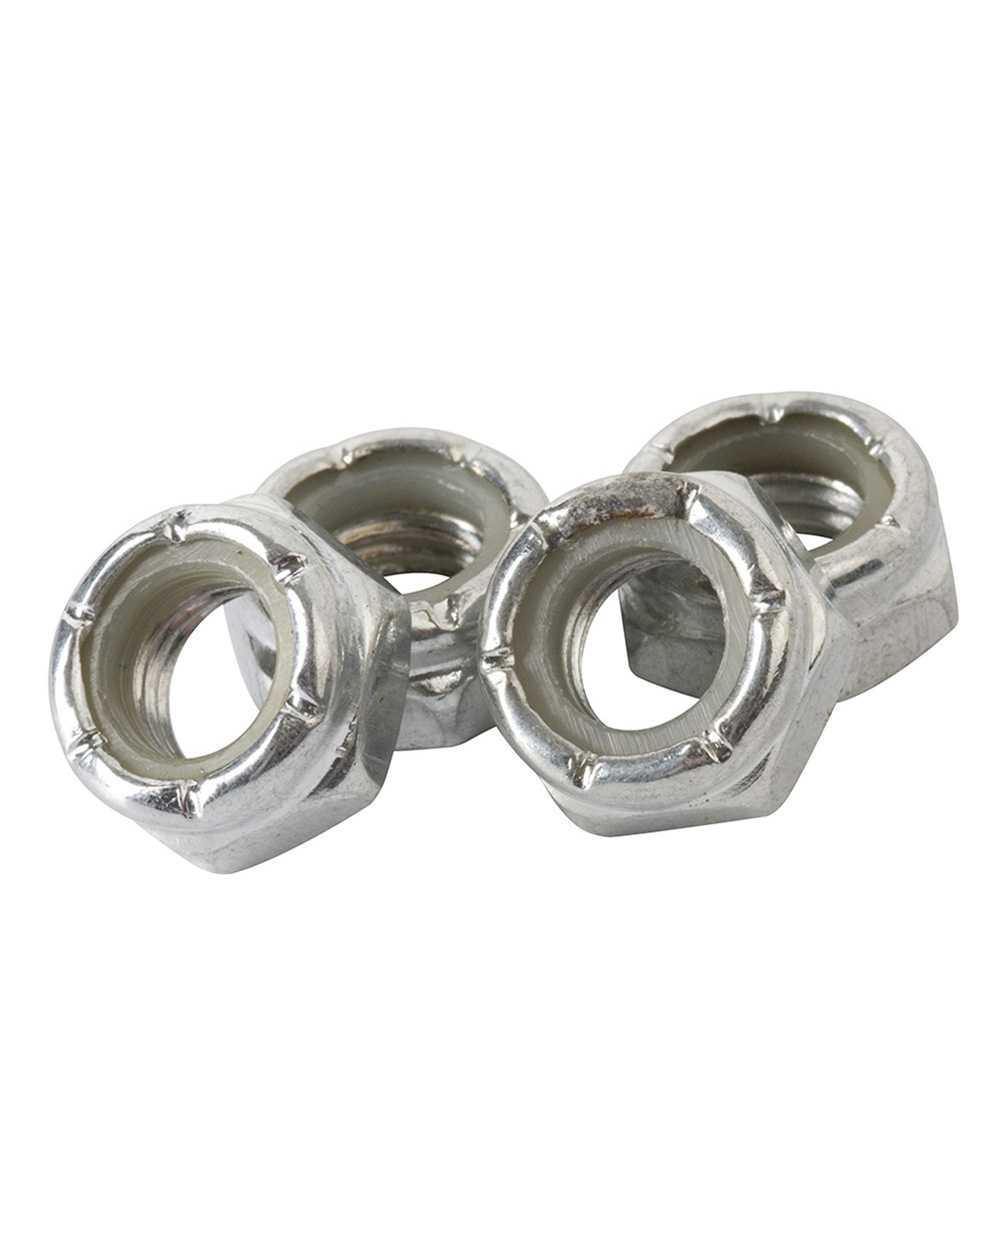 Enuff Axle Locking Axel Lock Nuts pack of 4